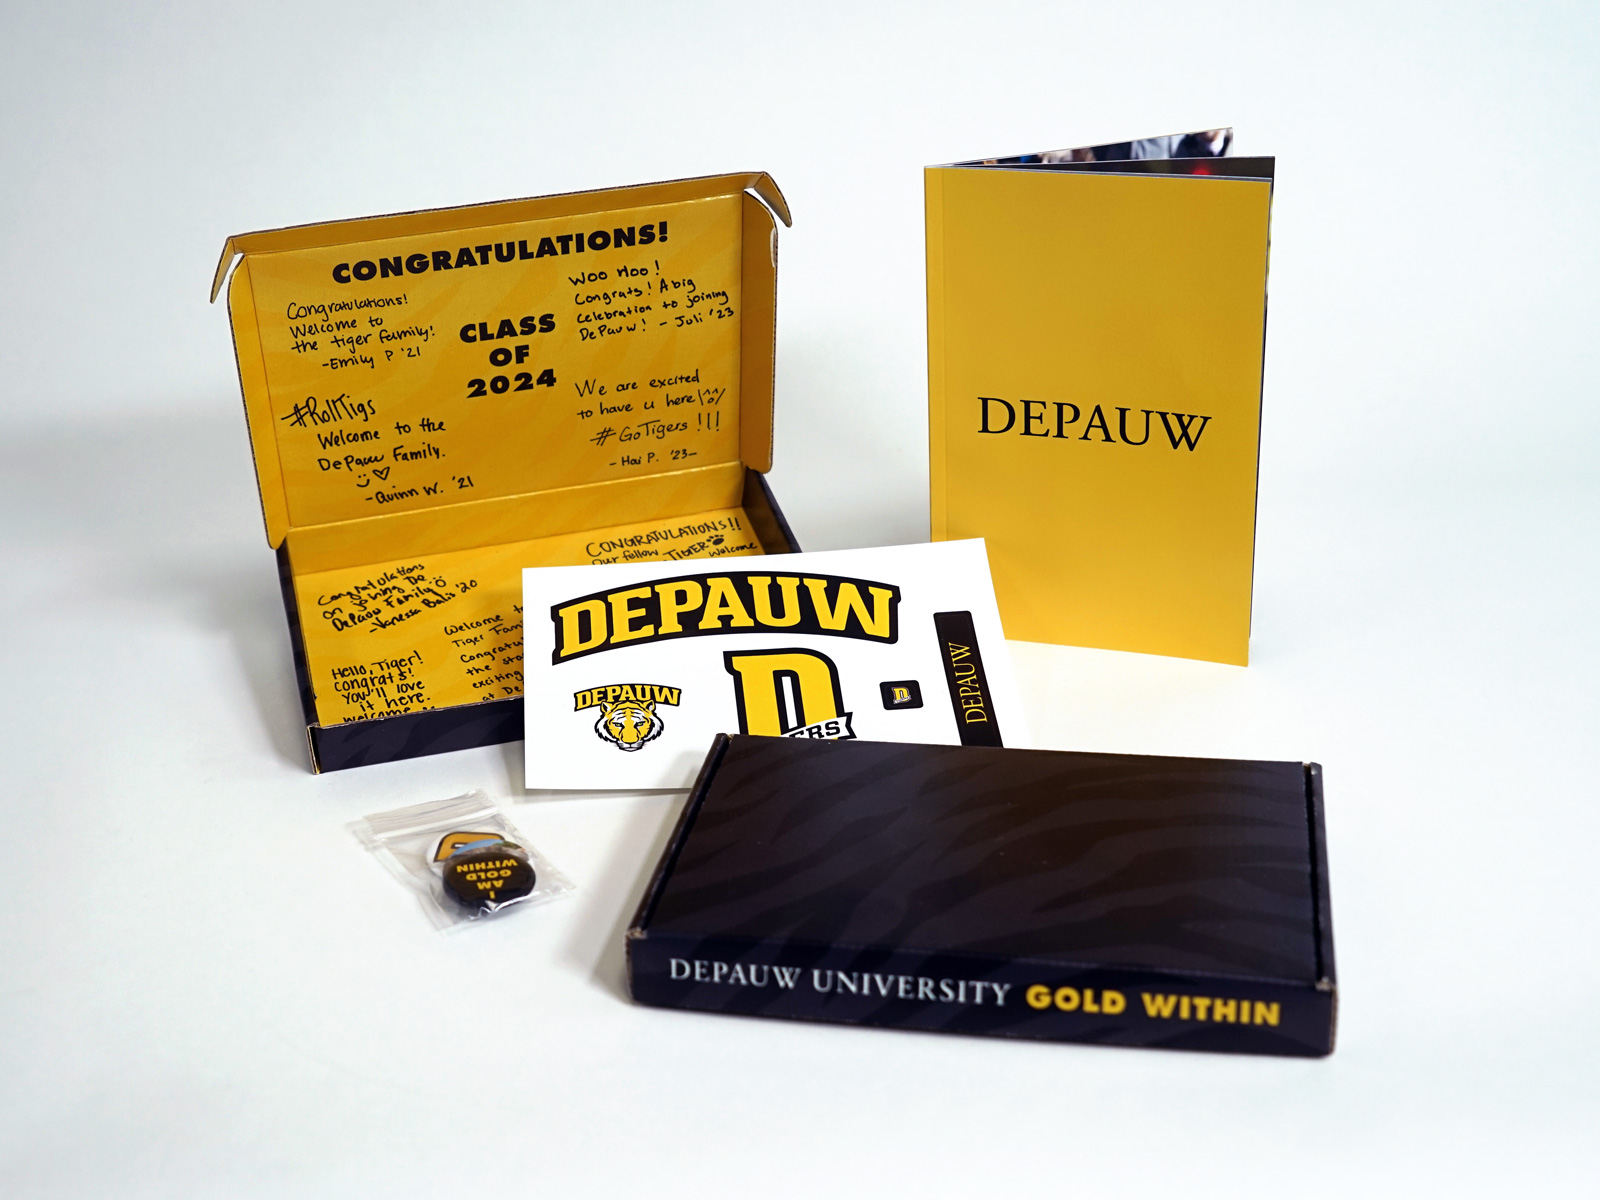 DePauw University Admit Kit